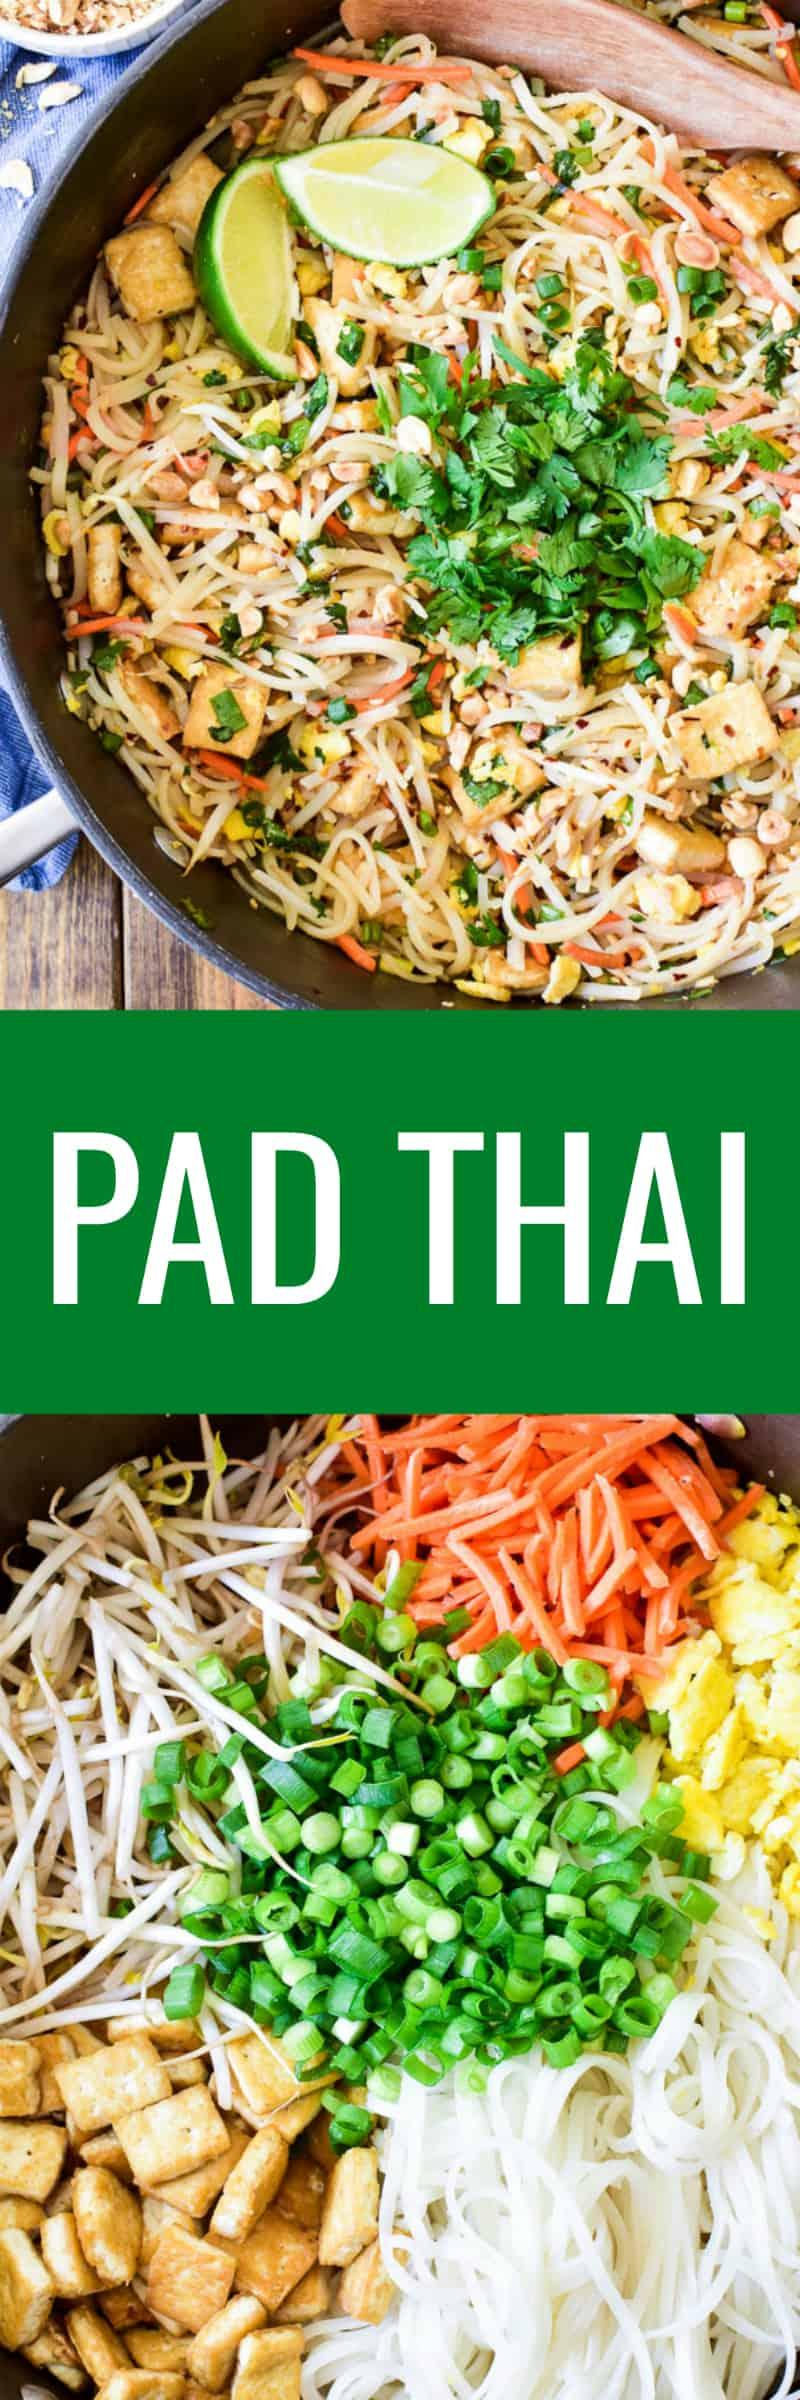 Collage image of Pad Thai